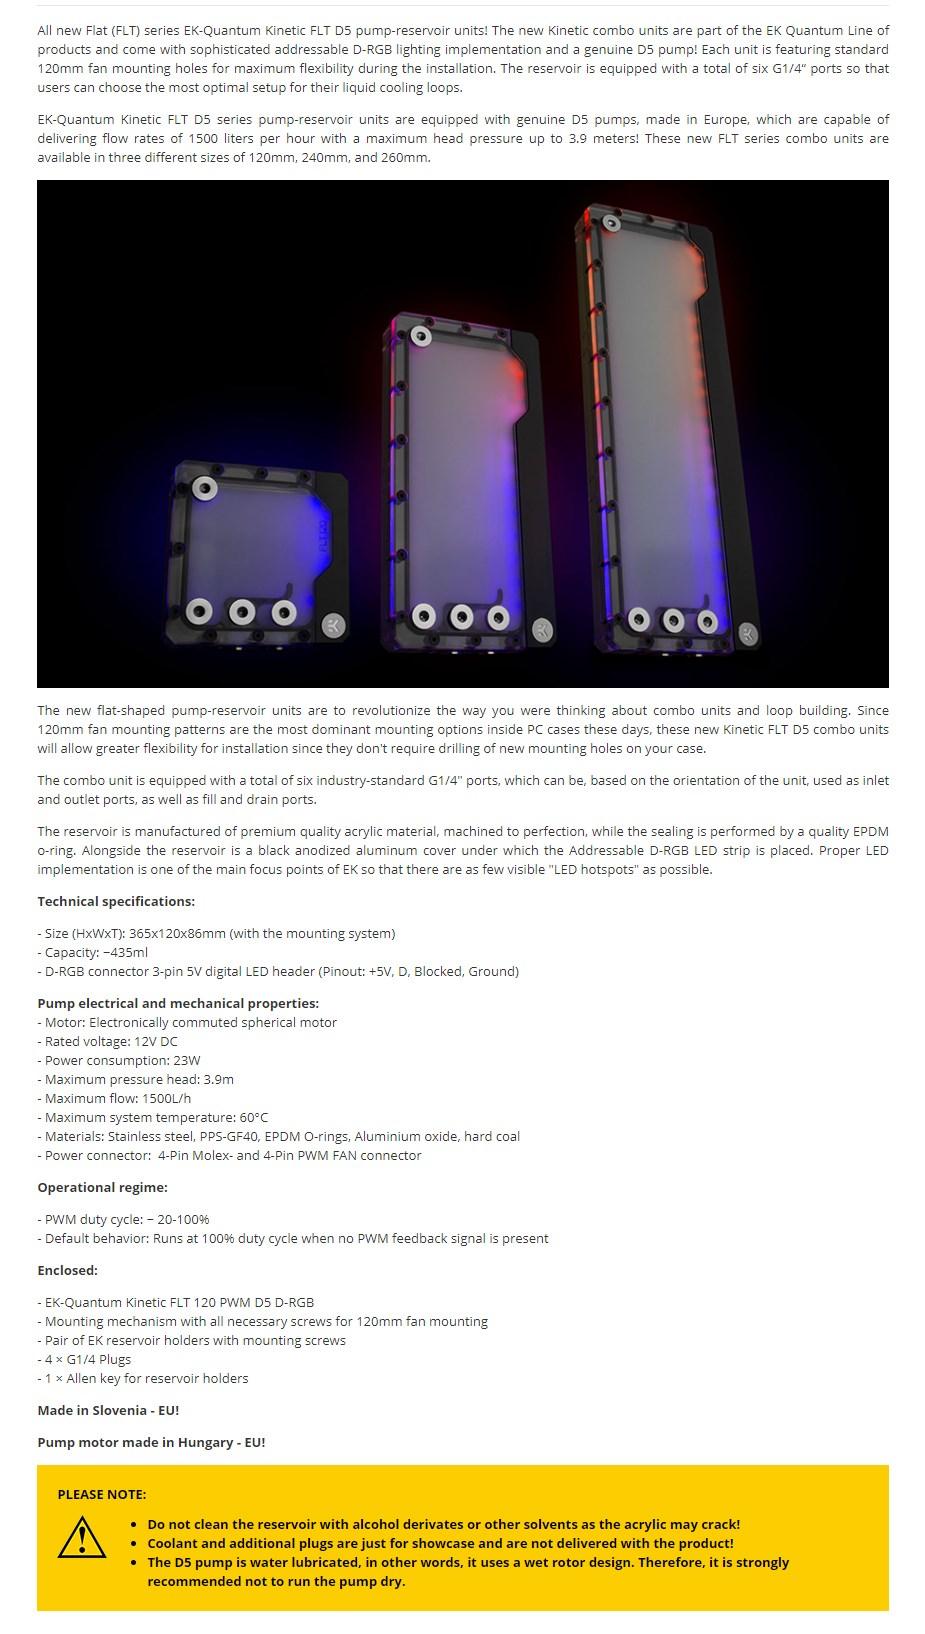 EKWB EK-Quantum Kinetic FLT 360 D5 PWM D-RGB Reservoir Pump Combo - Overview 1